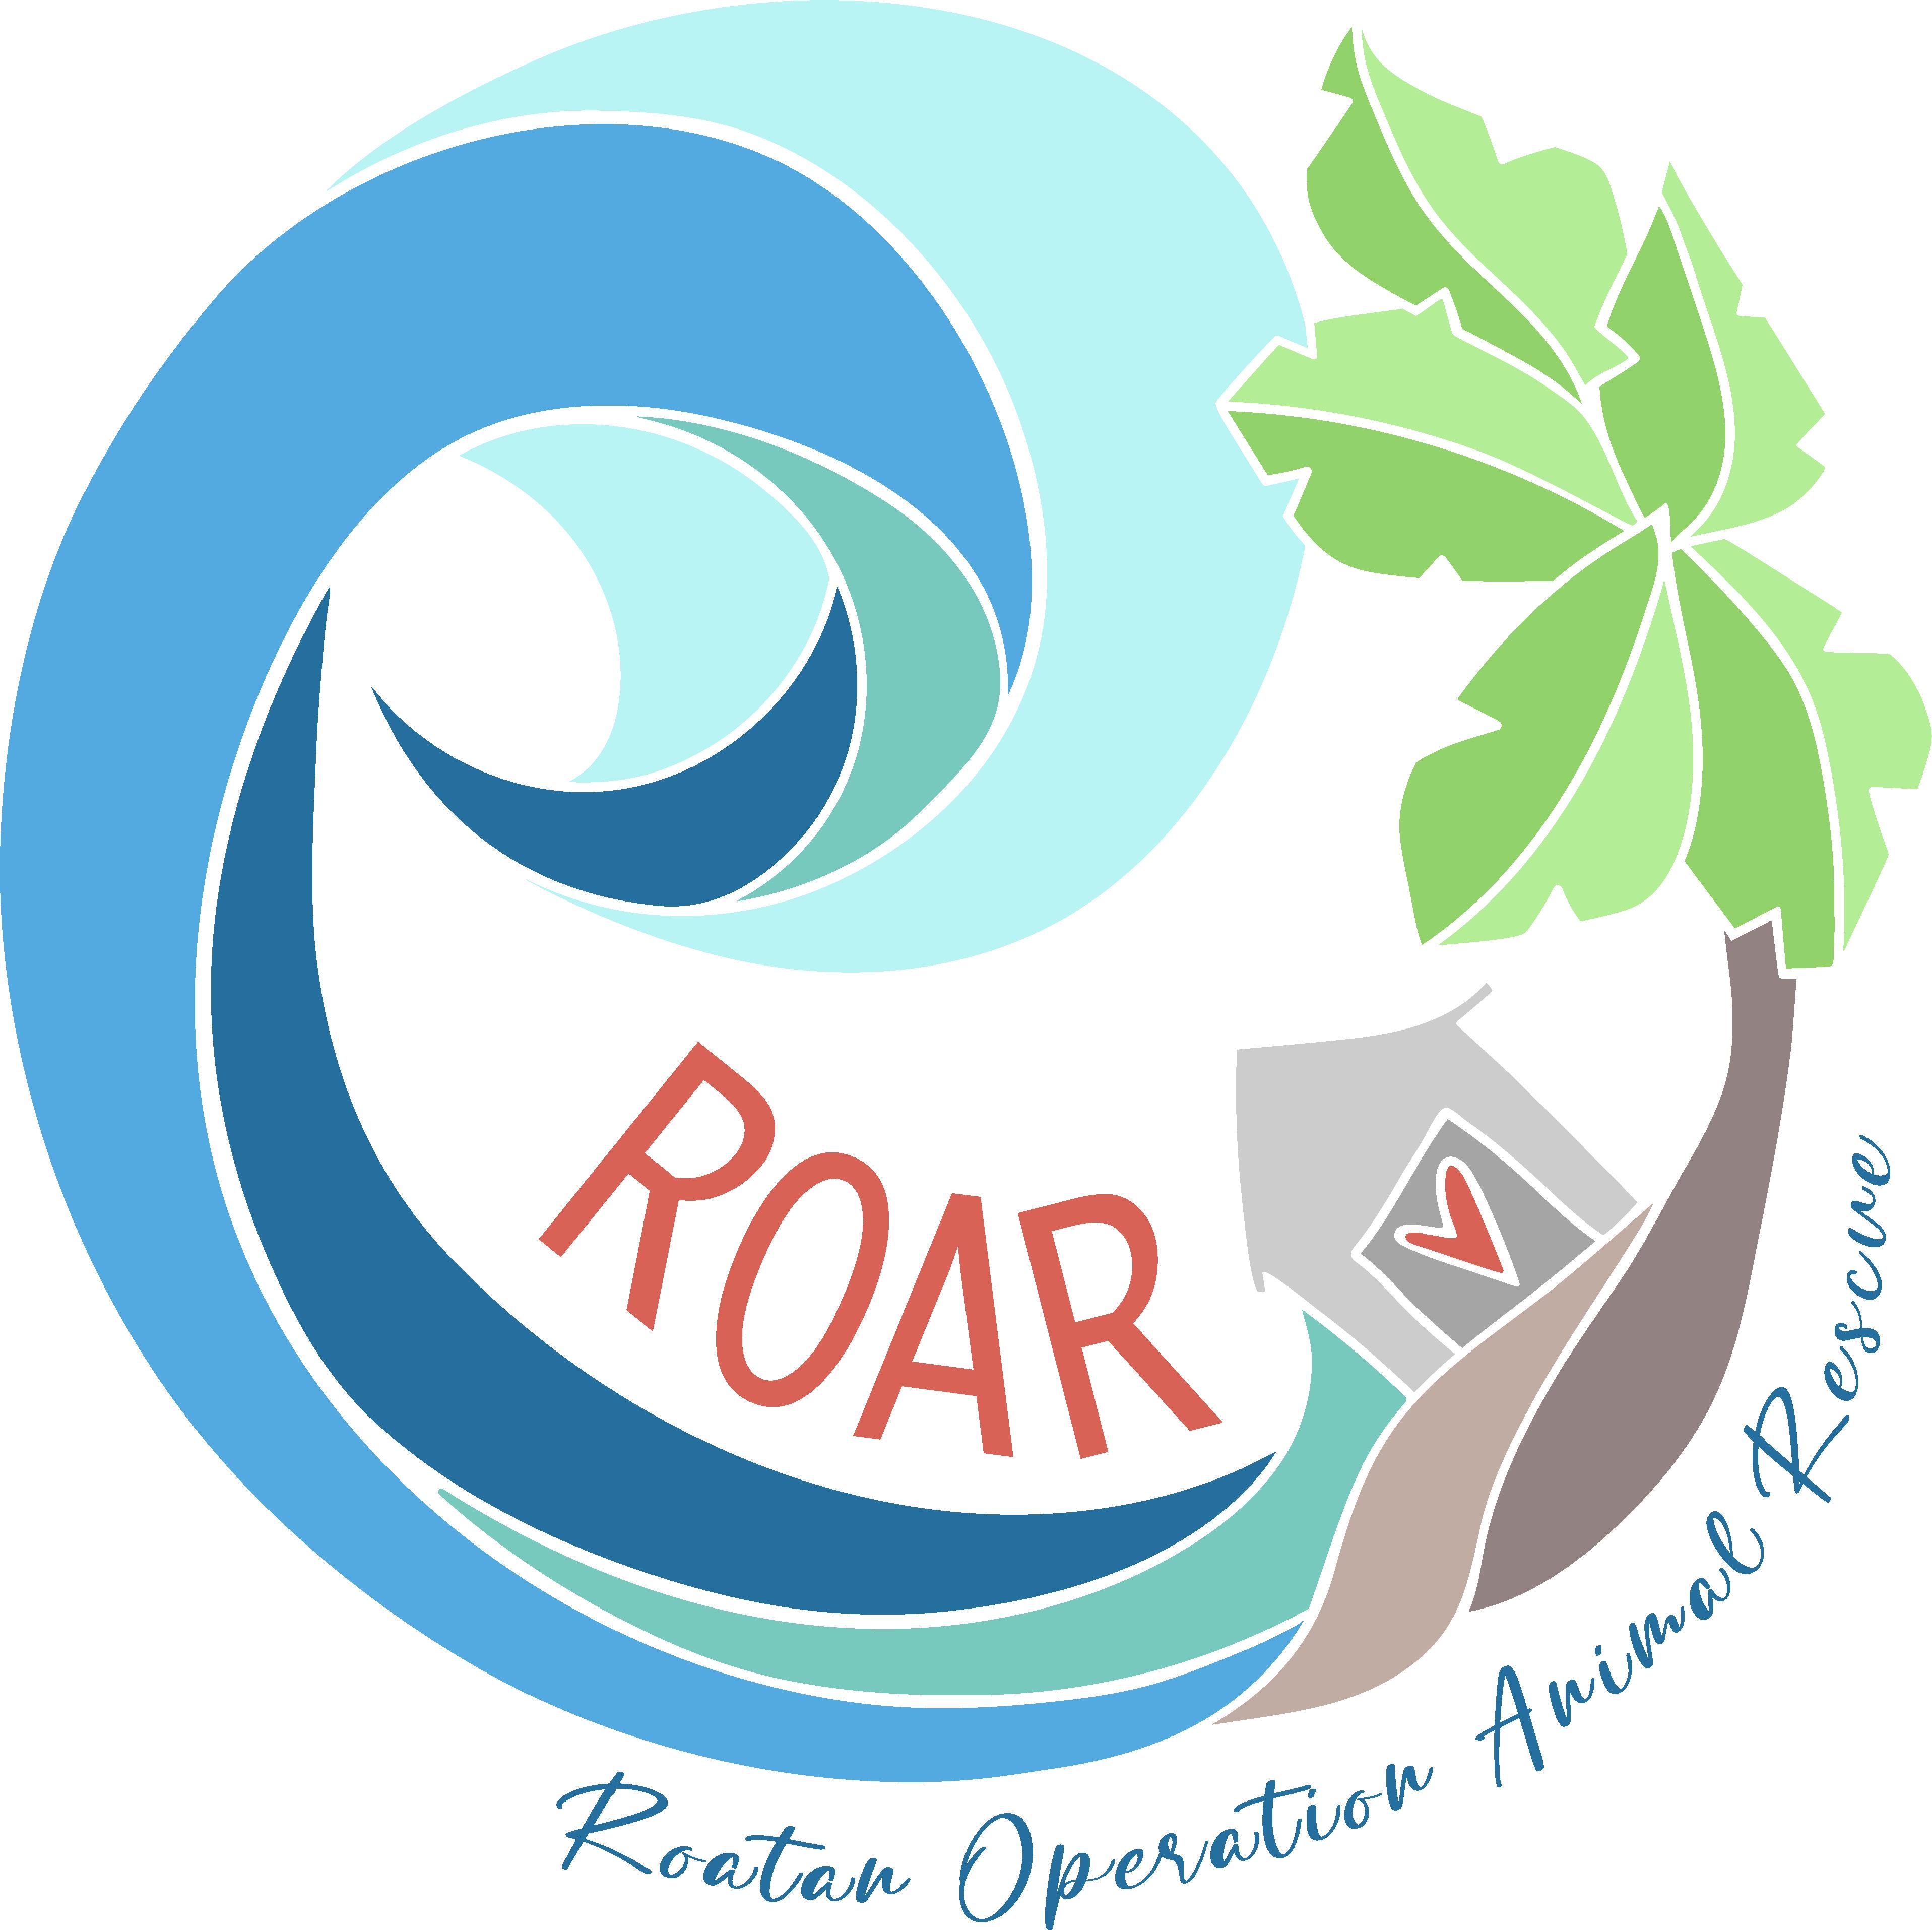 ROAR (Roatan Operation Animal Rescue)